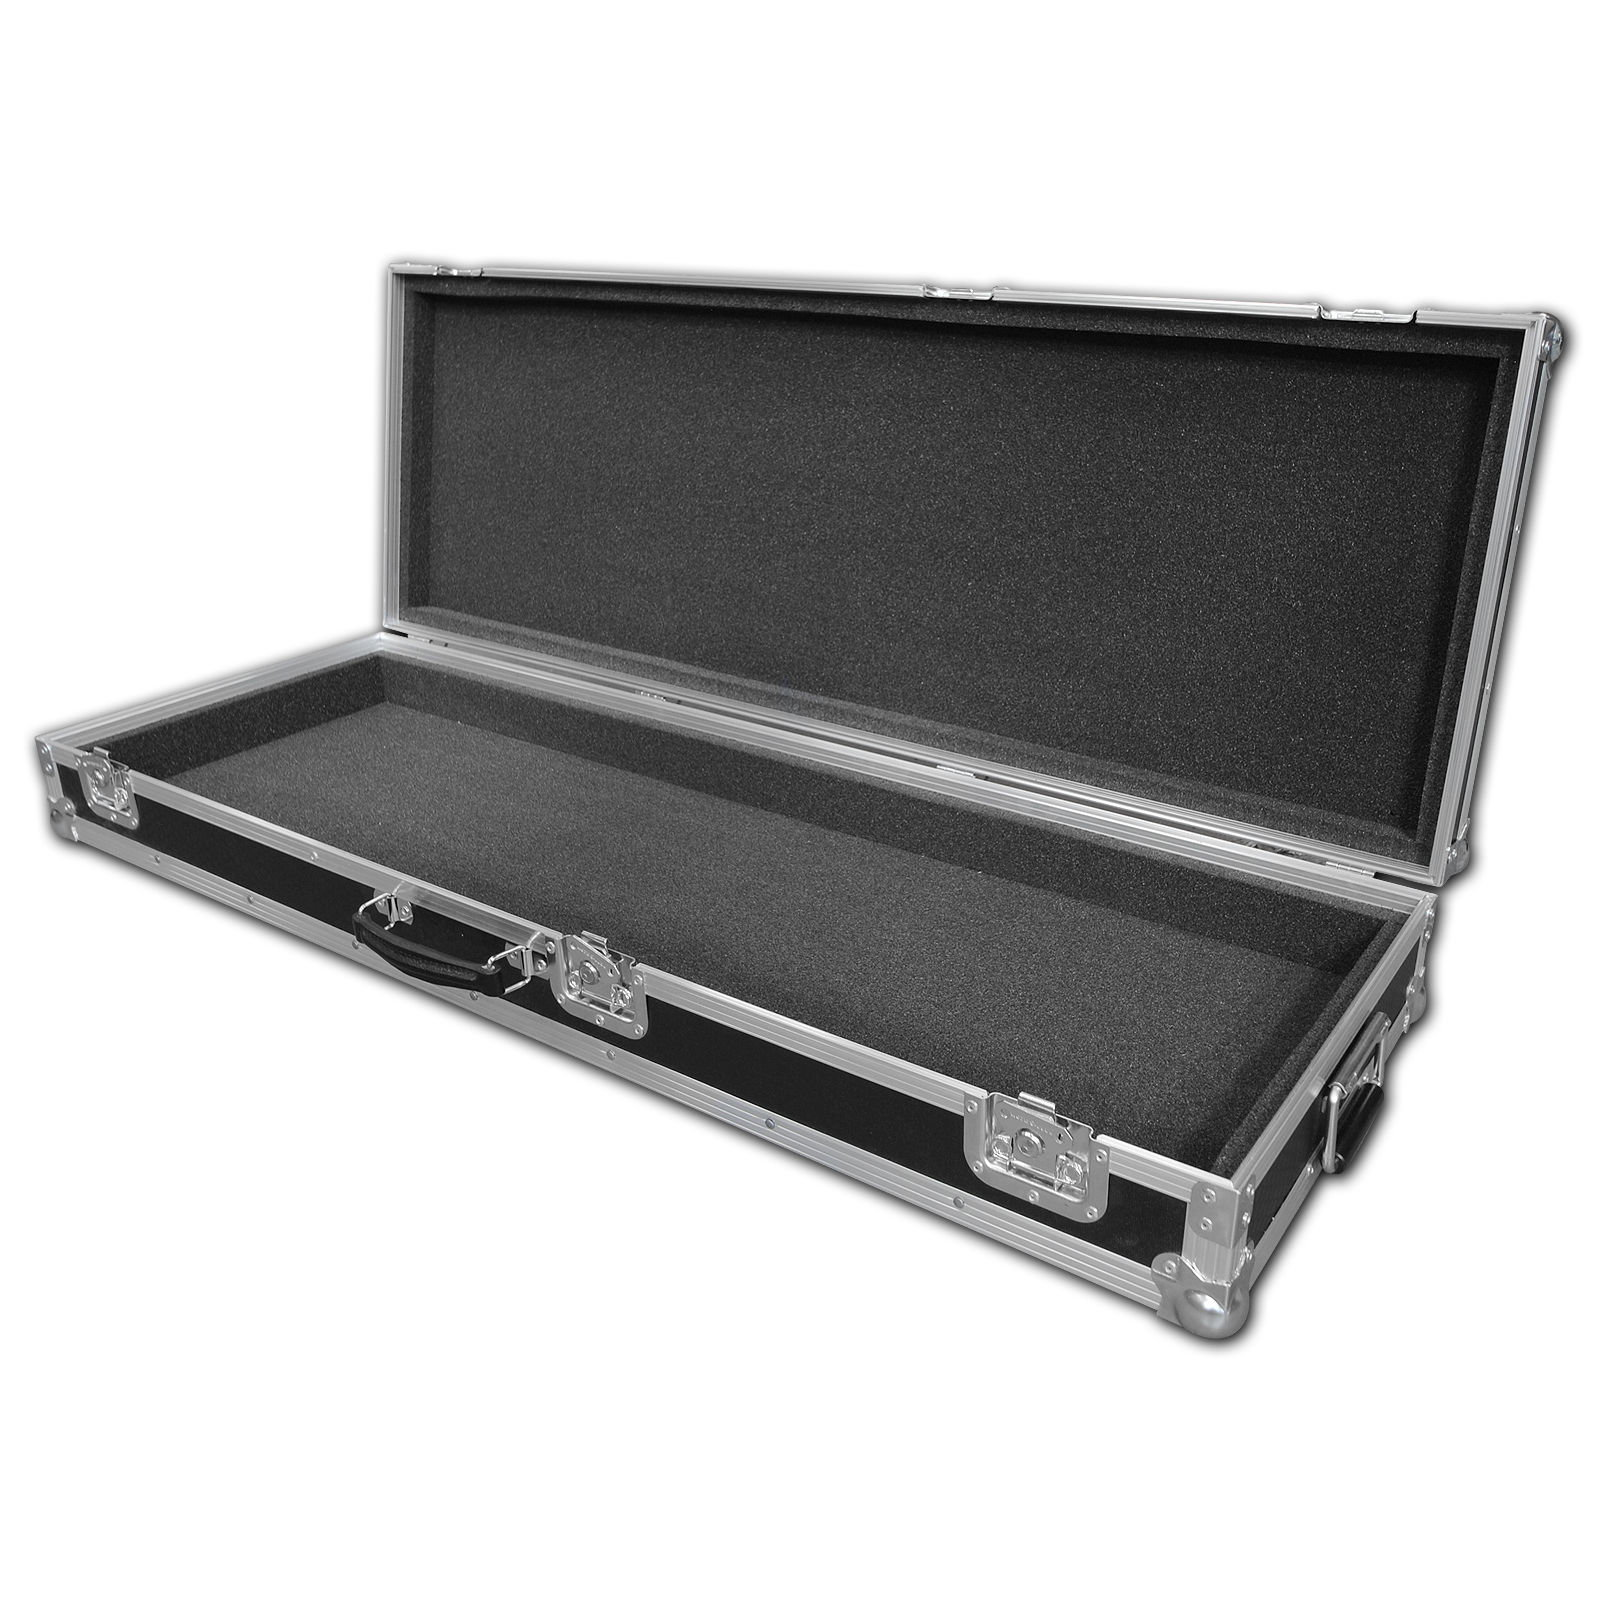 hard keyboard flight case for yamaha motif 8 heavy duty. Black Bedroom Furniture Sets. Home Design Ideas